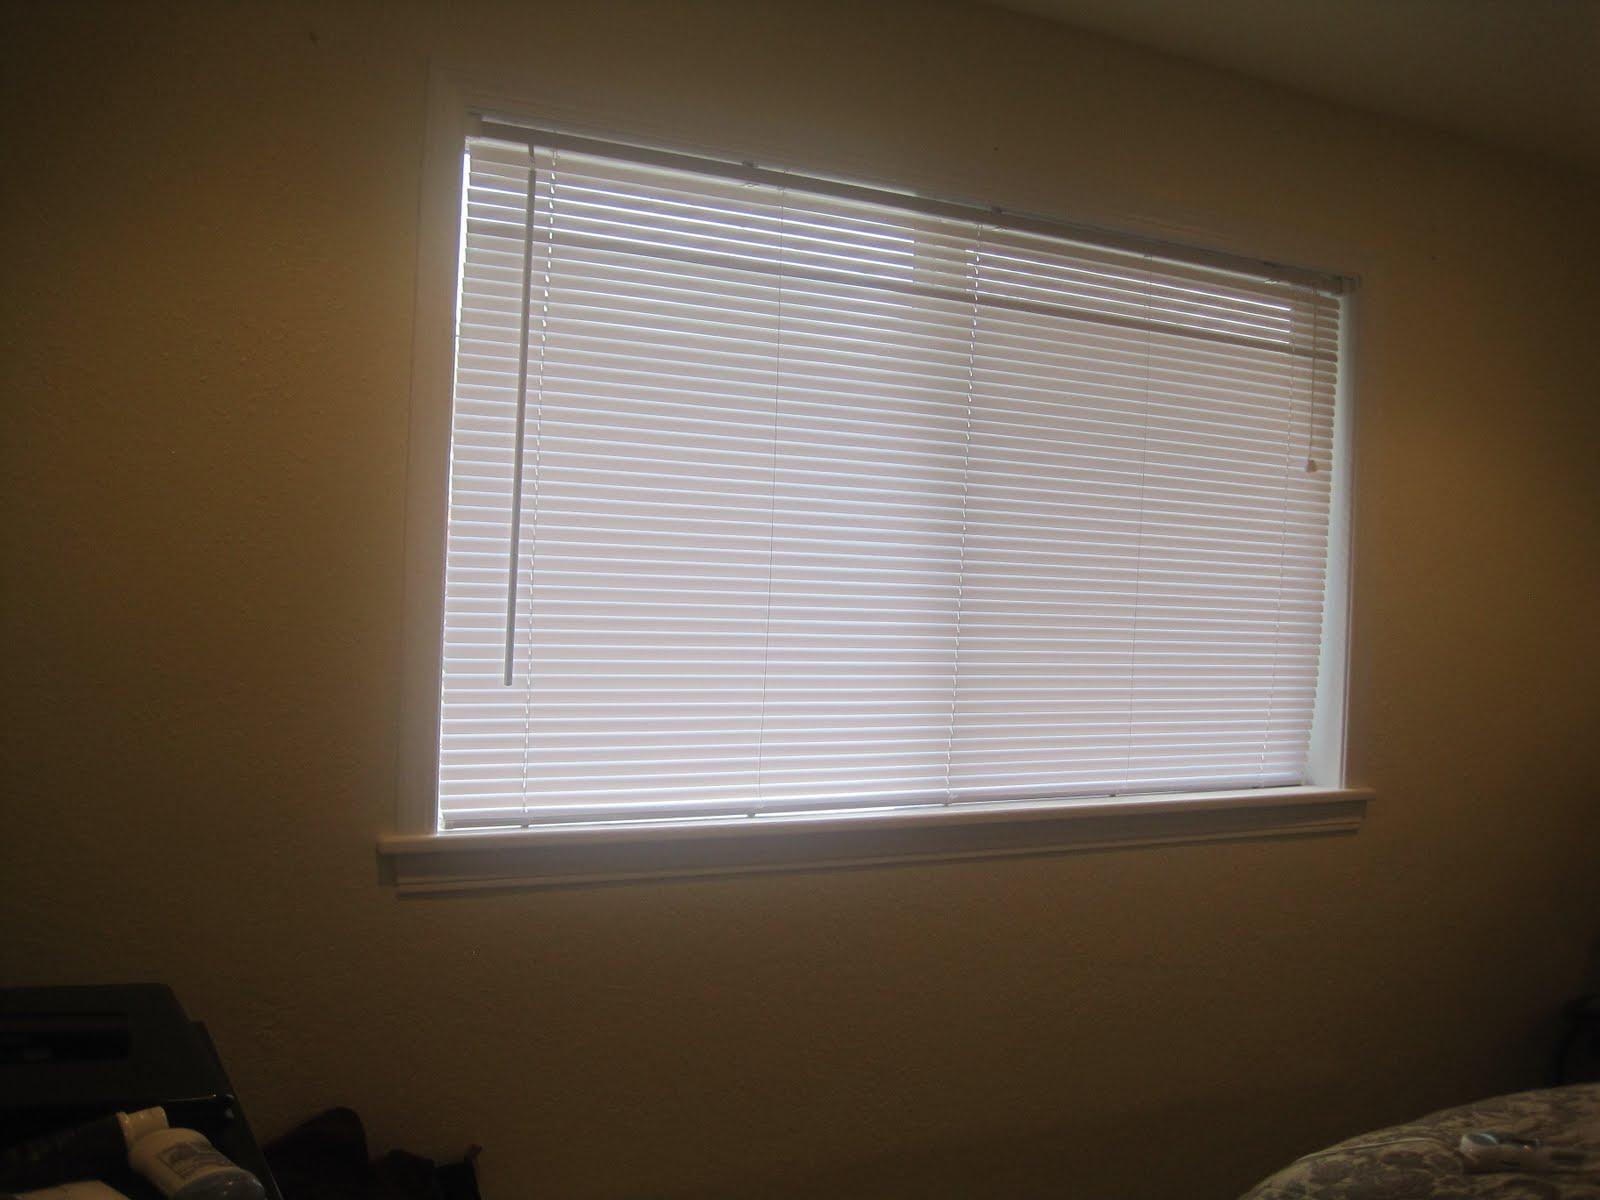 Home Depot Mini Blinds